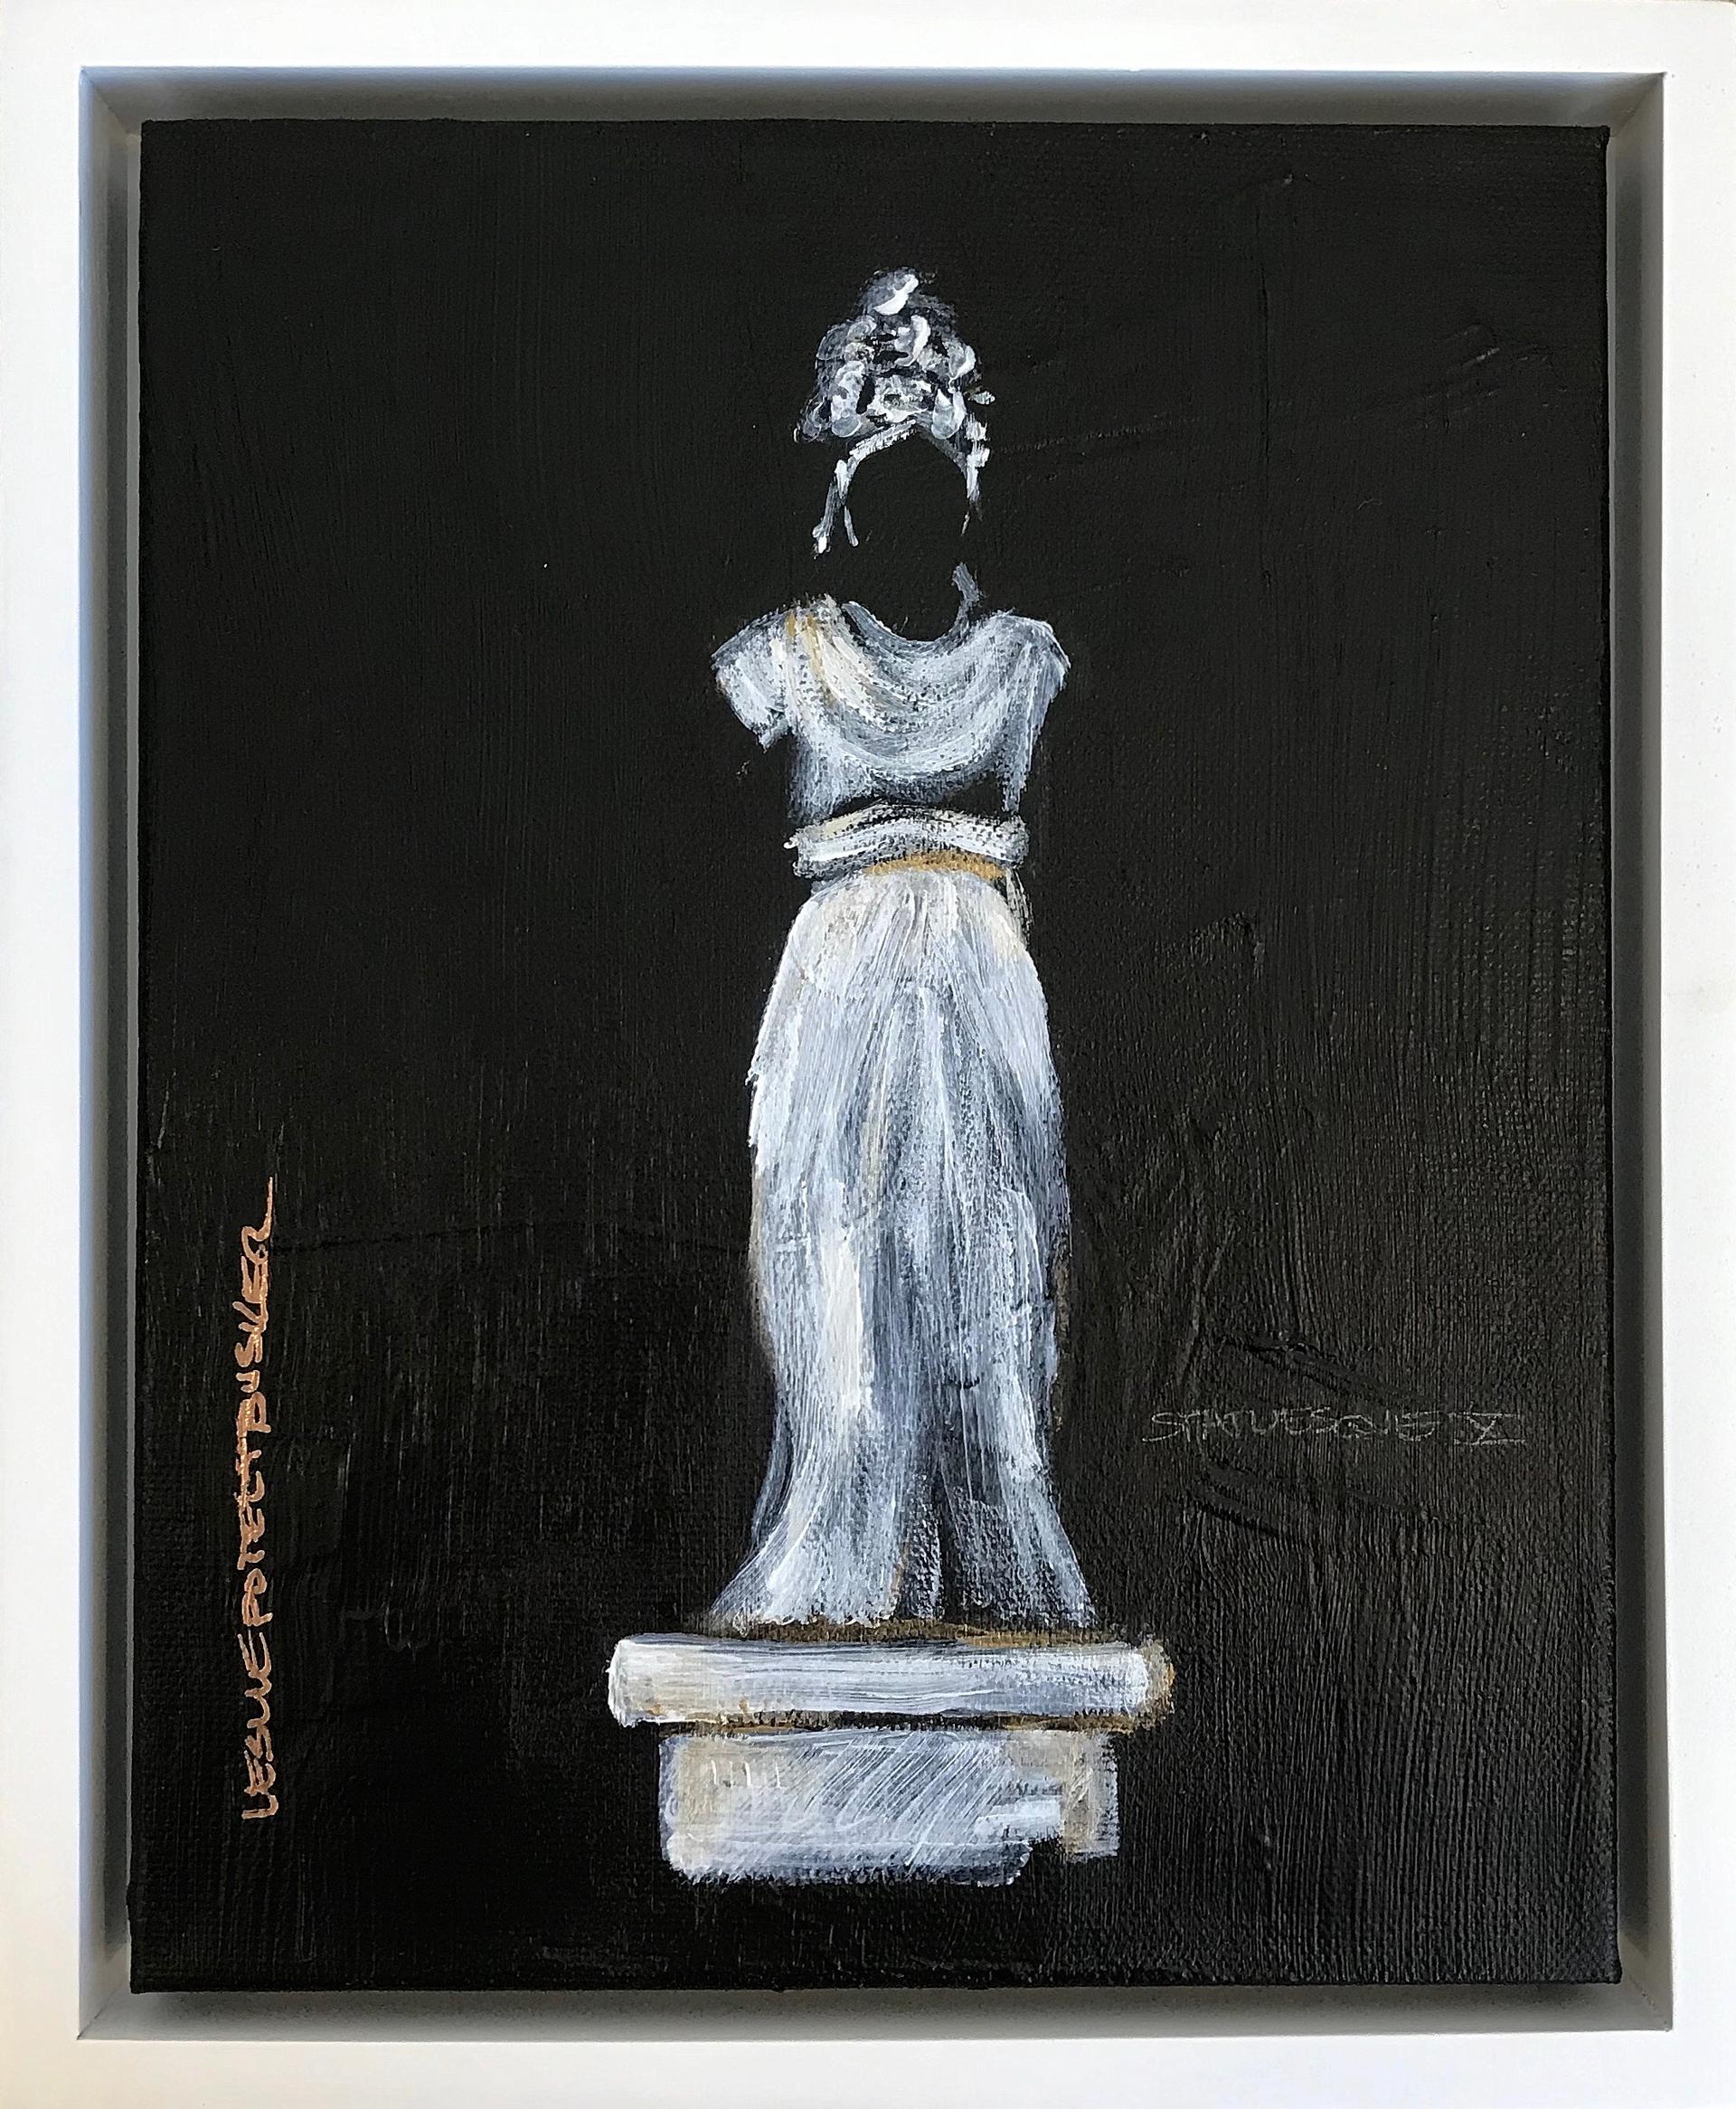 Statuesque X by Leslie Poteet Busker